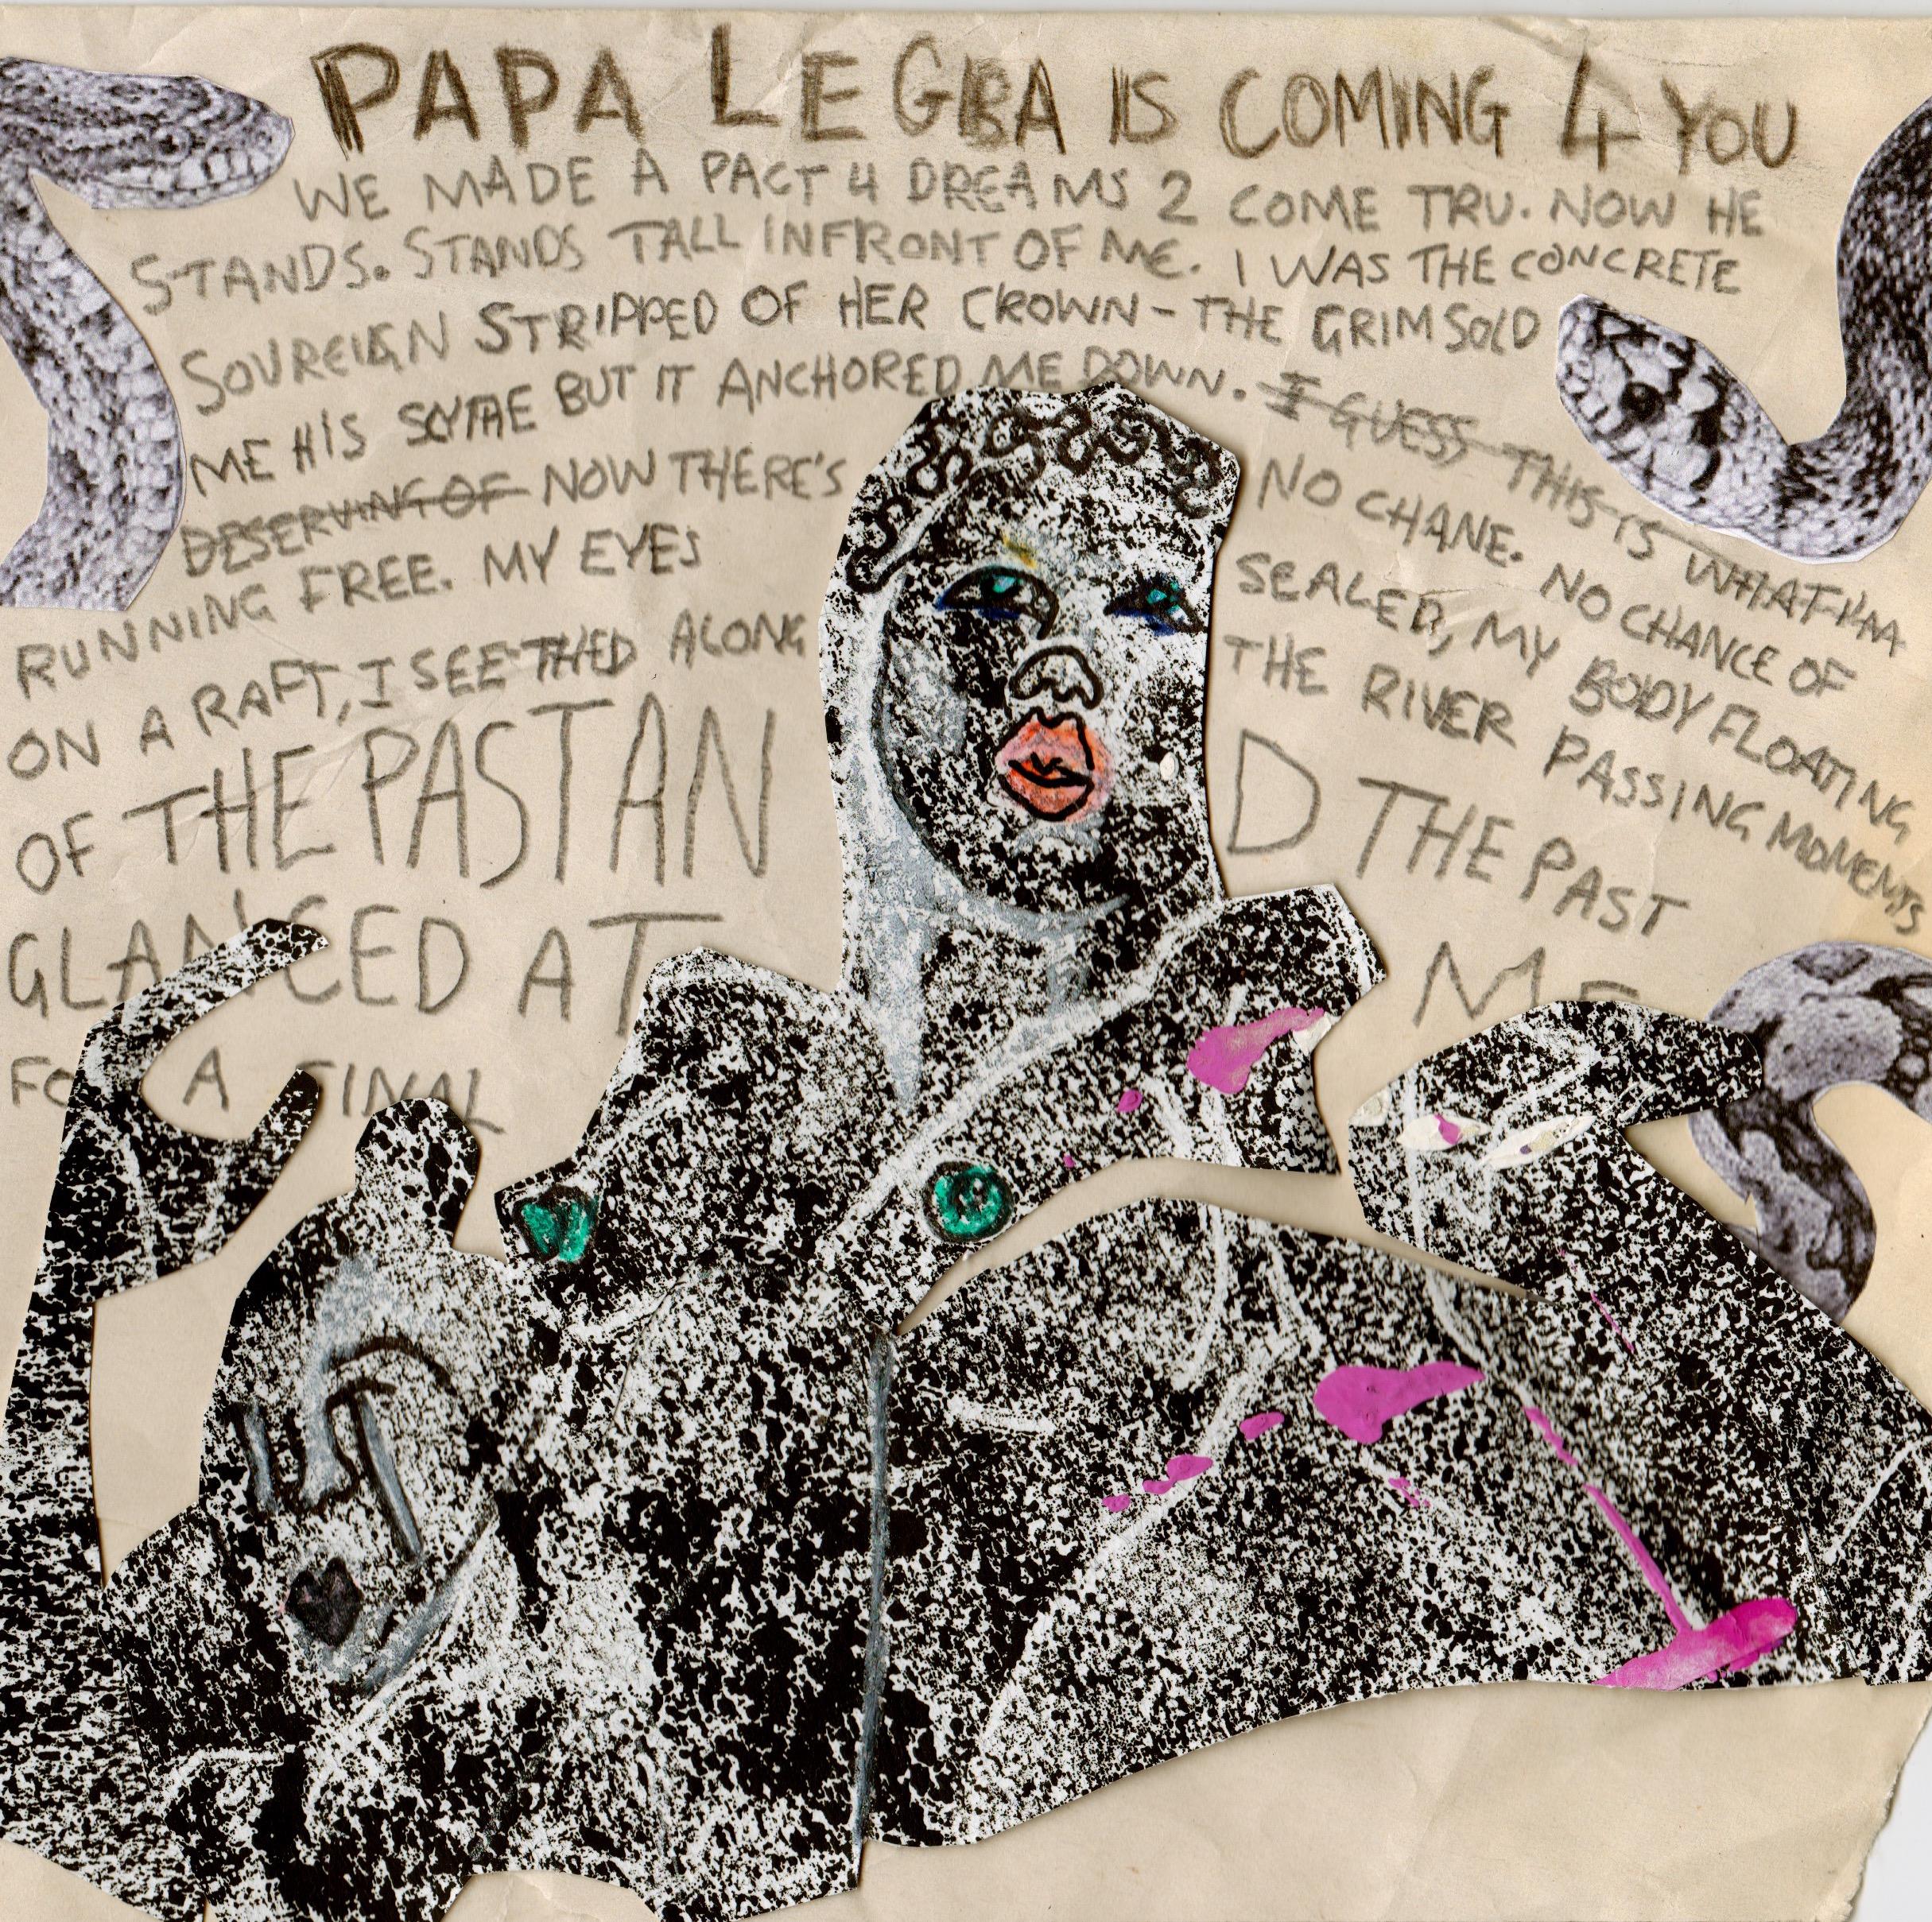 TRACK 6: PAPA LEGBA